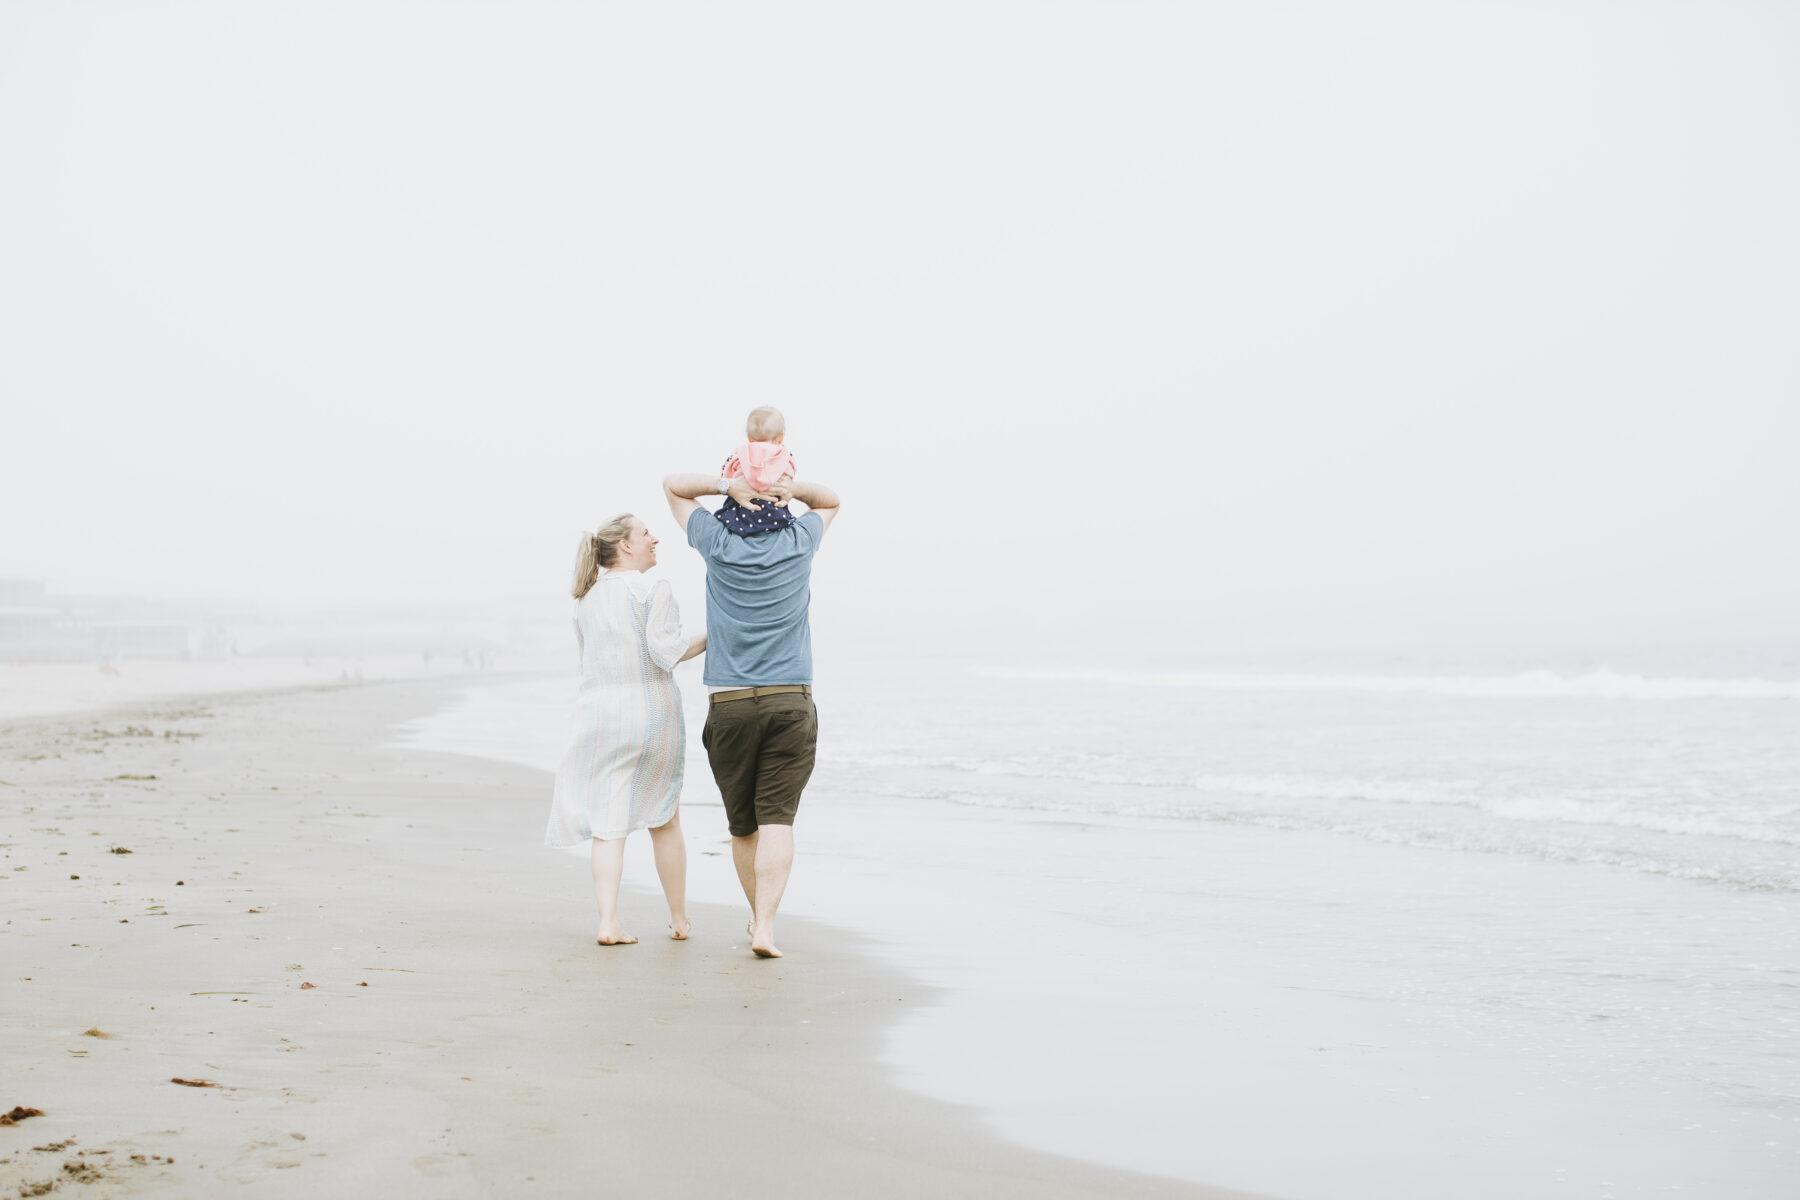 Rhode Island Beach Family Session Jen and Mark Blueflash Photography 9